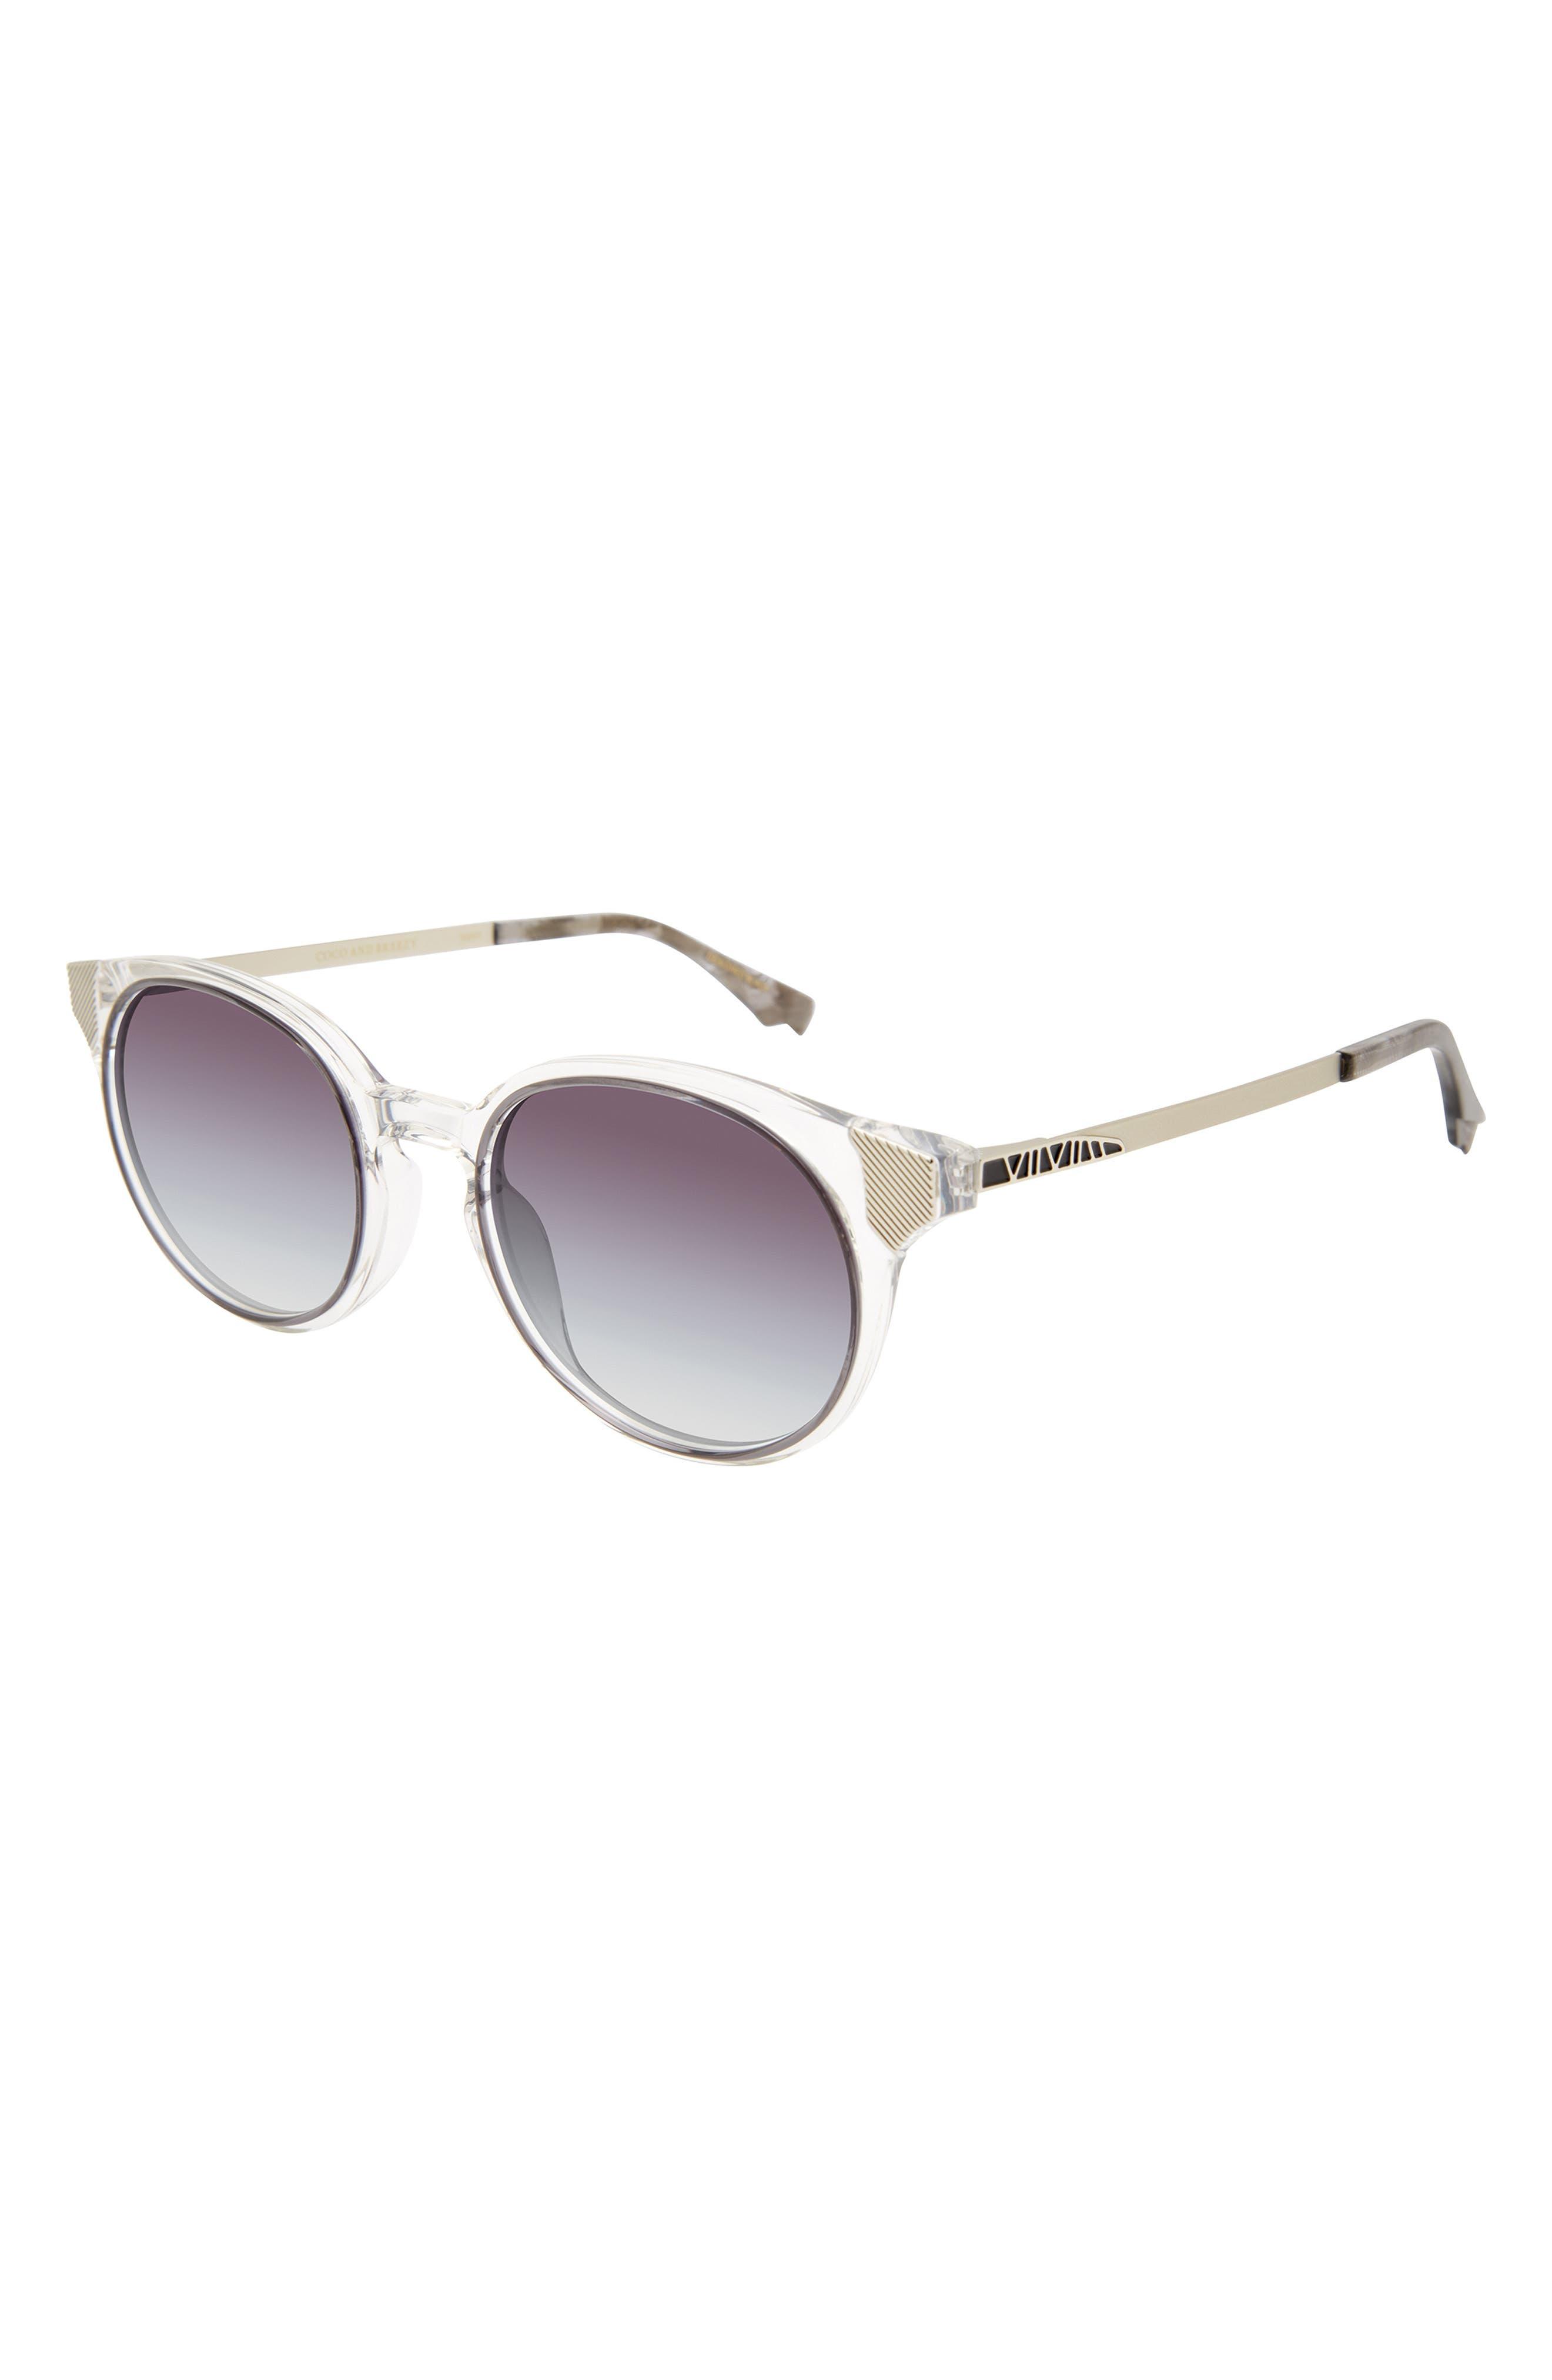 Inspire 53mm Round Sunglasses